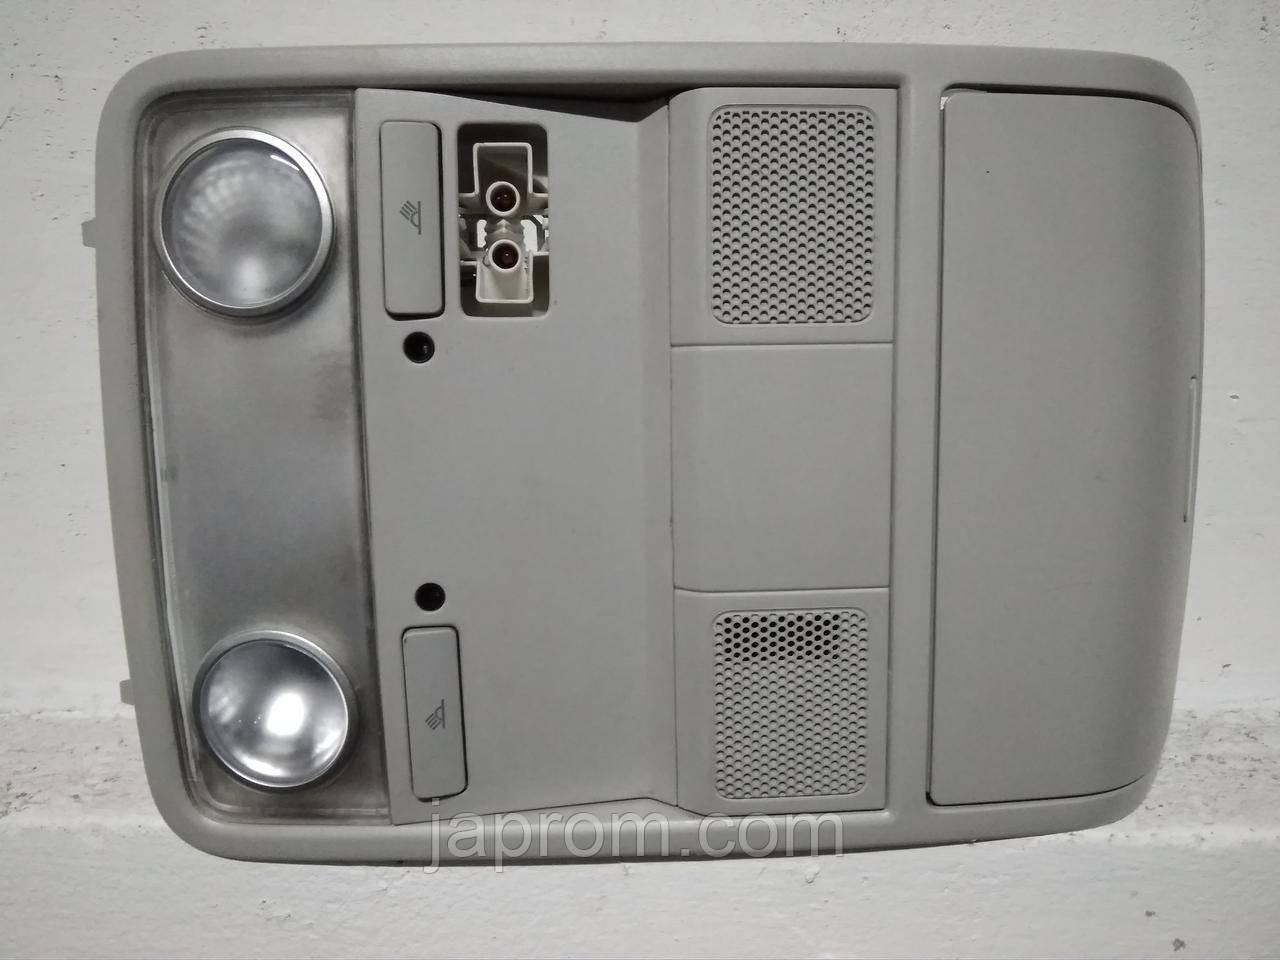 Плафон салона перед Volkswagen Passat B6 2005-2010г.в. (дефект)